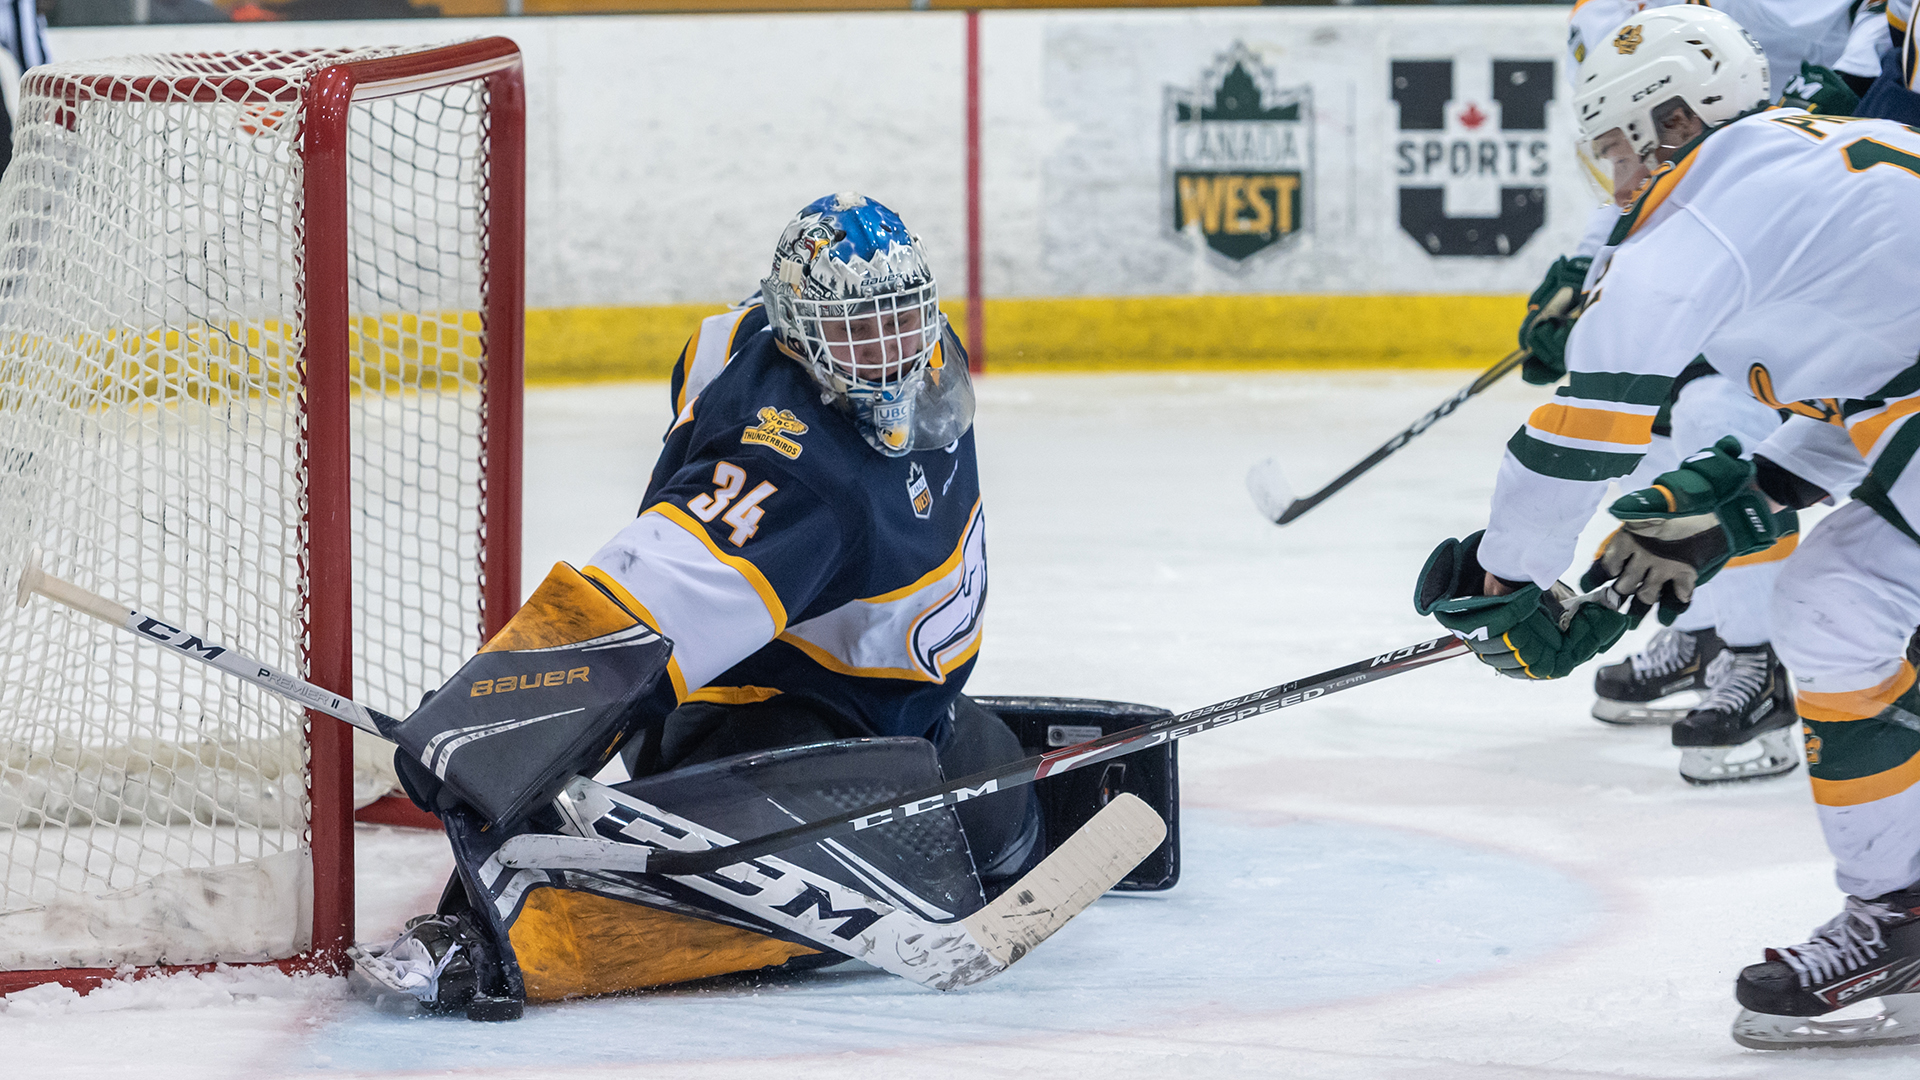 Charles_Penner-SidelineReplays_2020-02-21-Hockey_-_UofA_Bears_vs_UBC_Thunderbirds-011962.jpg (1.44 MB)